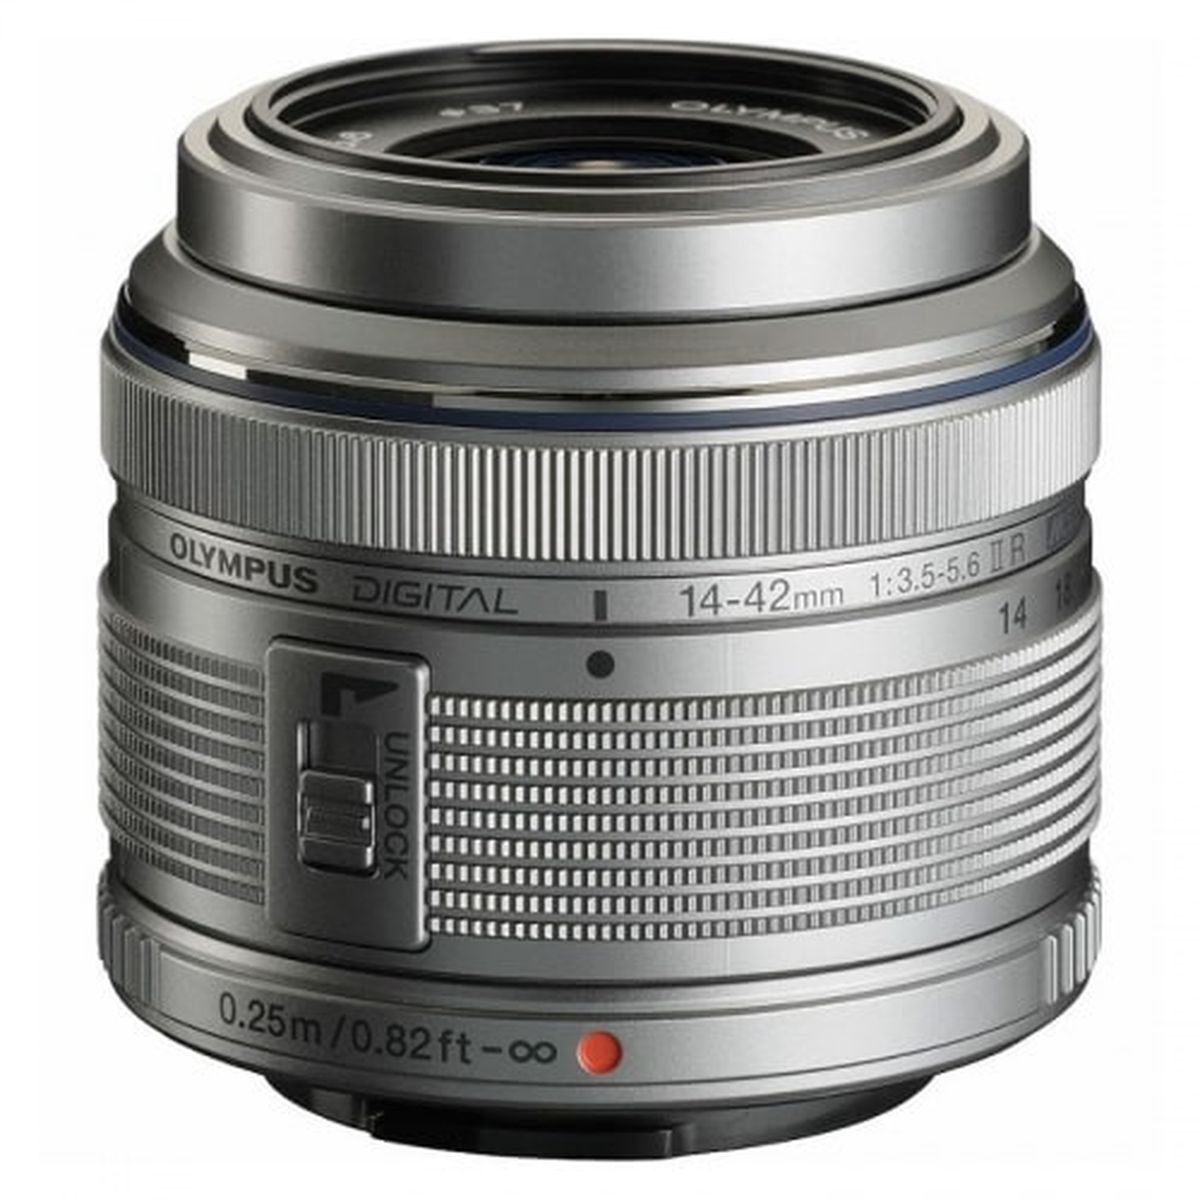 Объектив Olympus M.Zuiko Digital ED 14-42mm F3.5-5.6 II R, серебристый